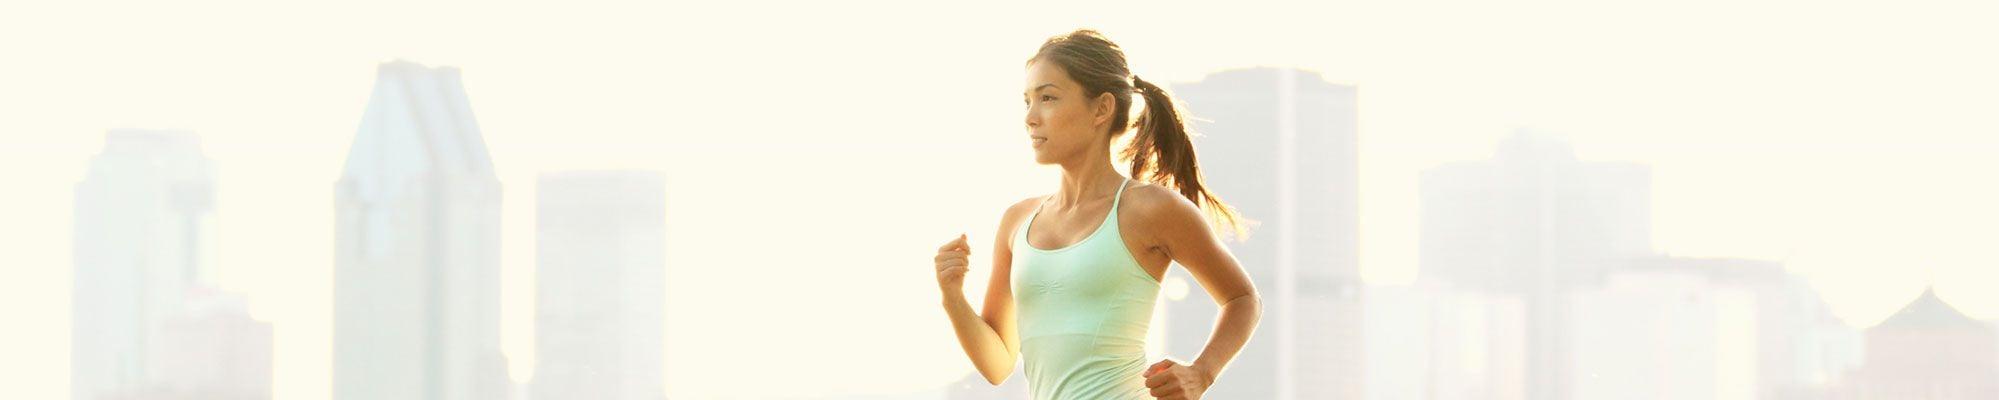 Health & Wellness Practices Survey